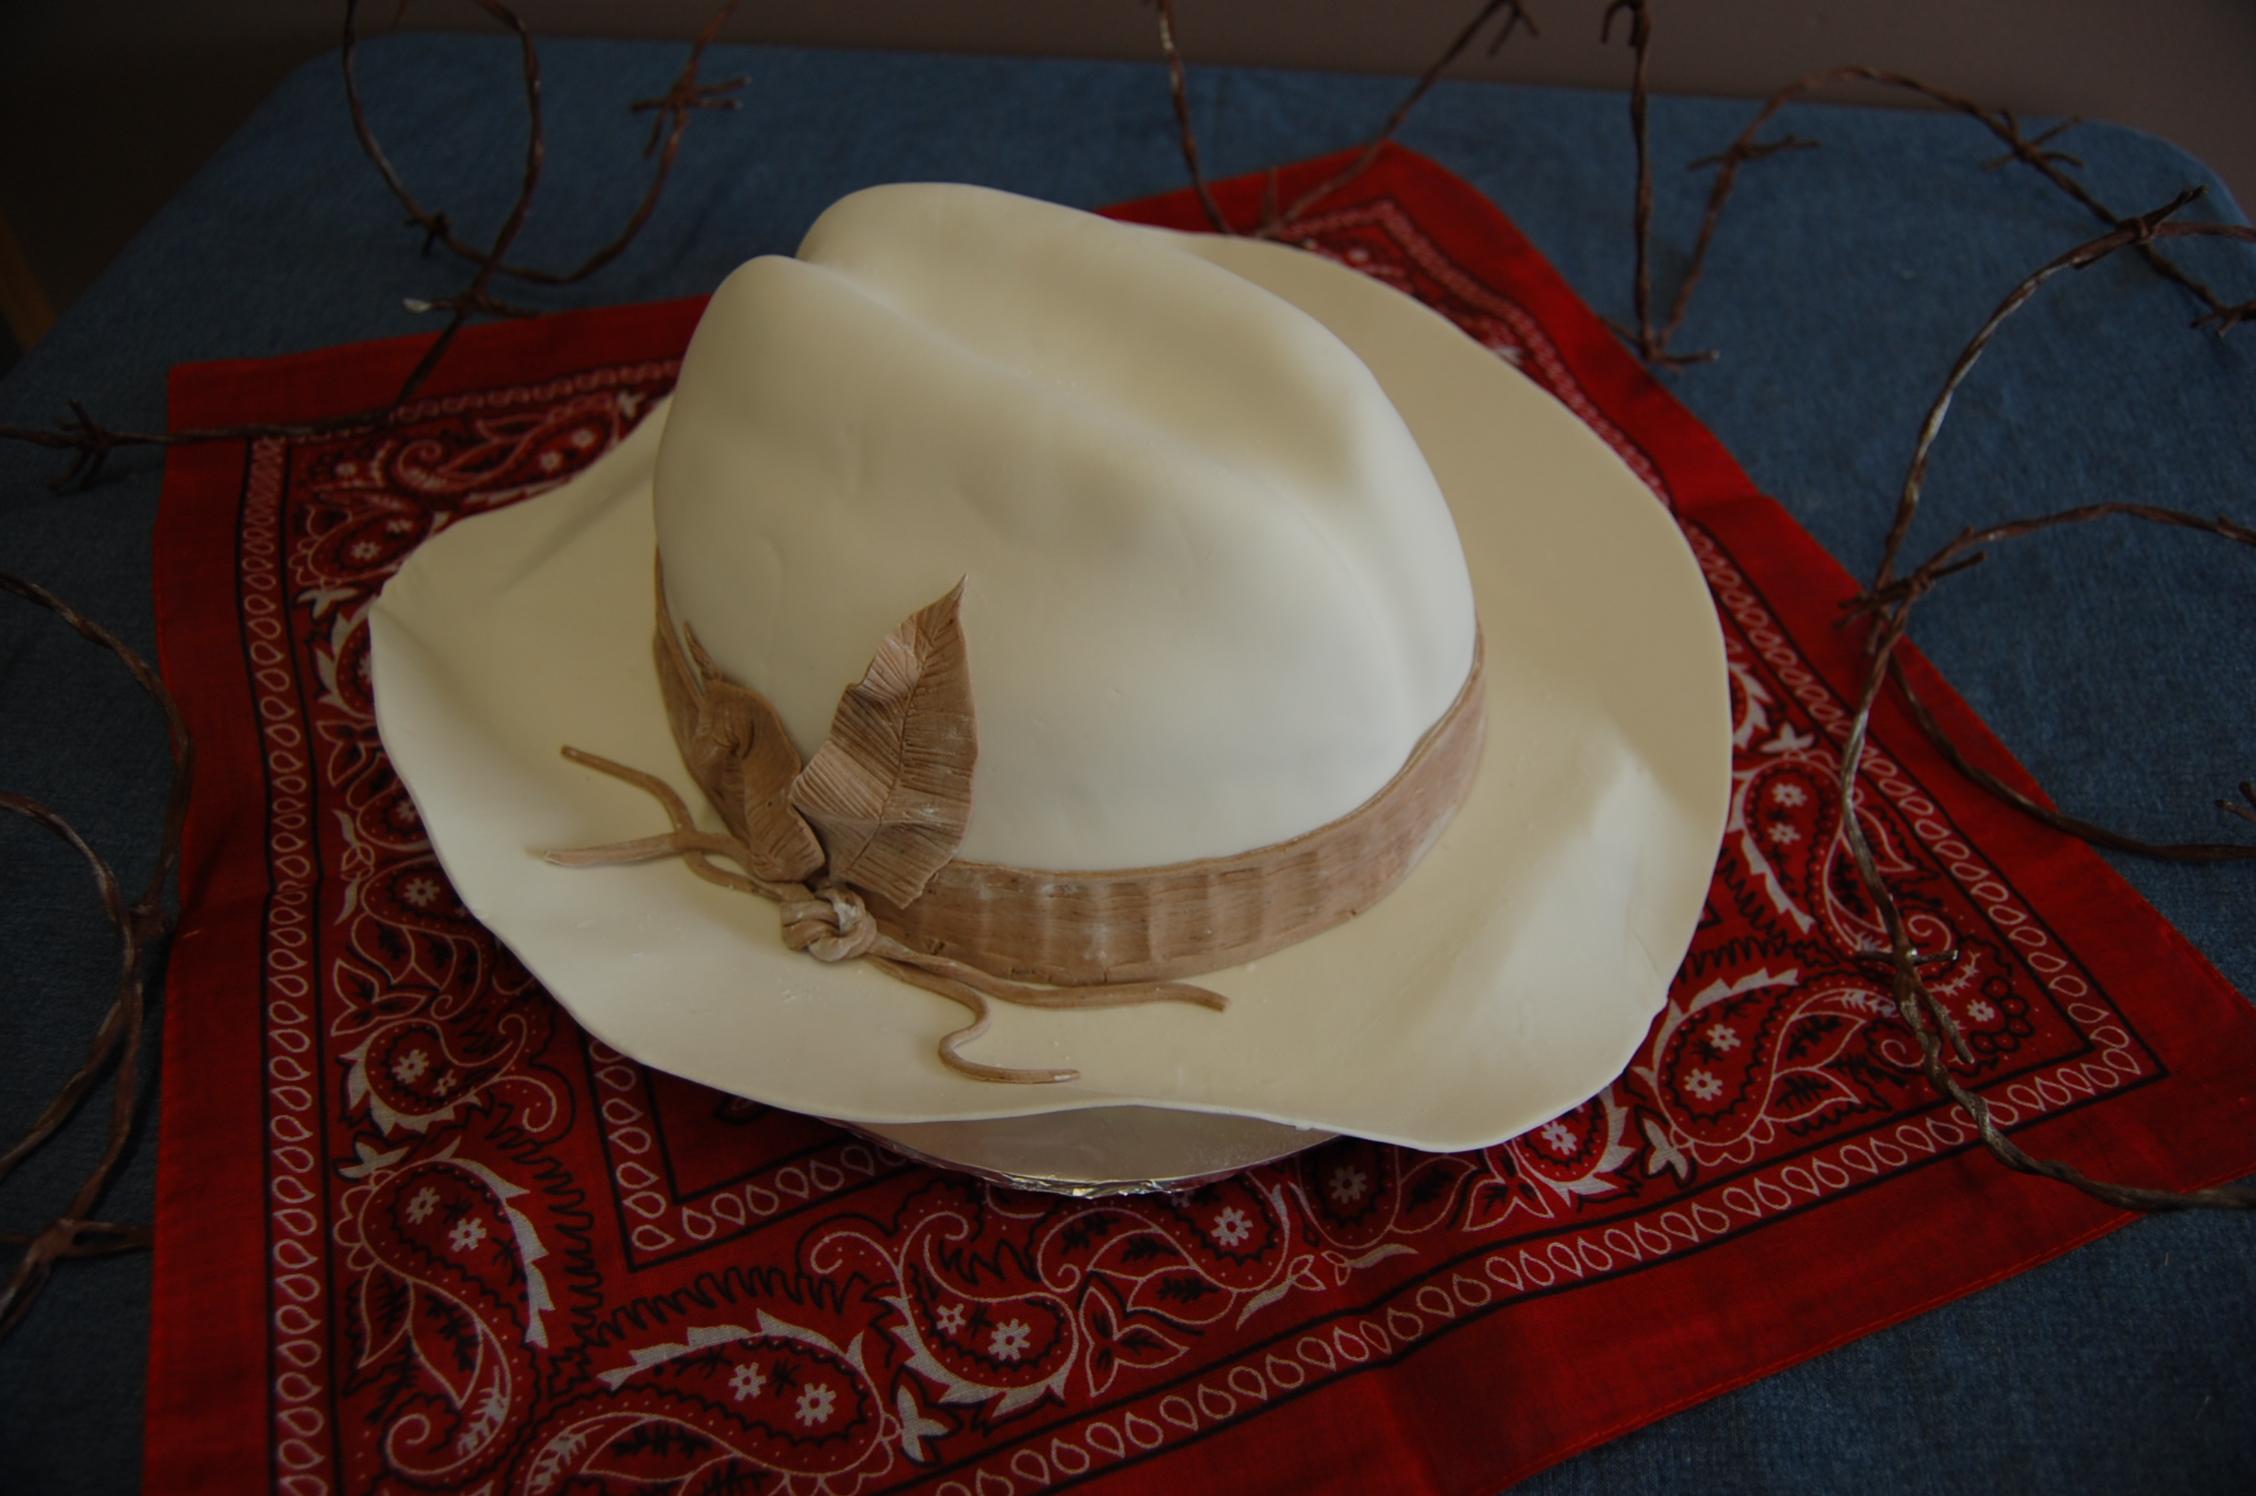 Beautiful fresh flowers on wedding cakes - Cowboy Hat Cake Amp Wedding Cake Let S Get Cooking